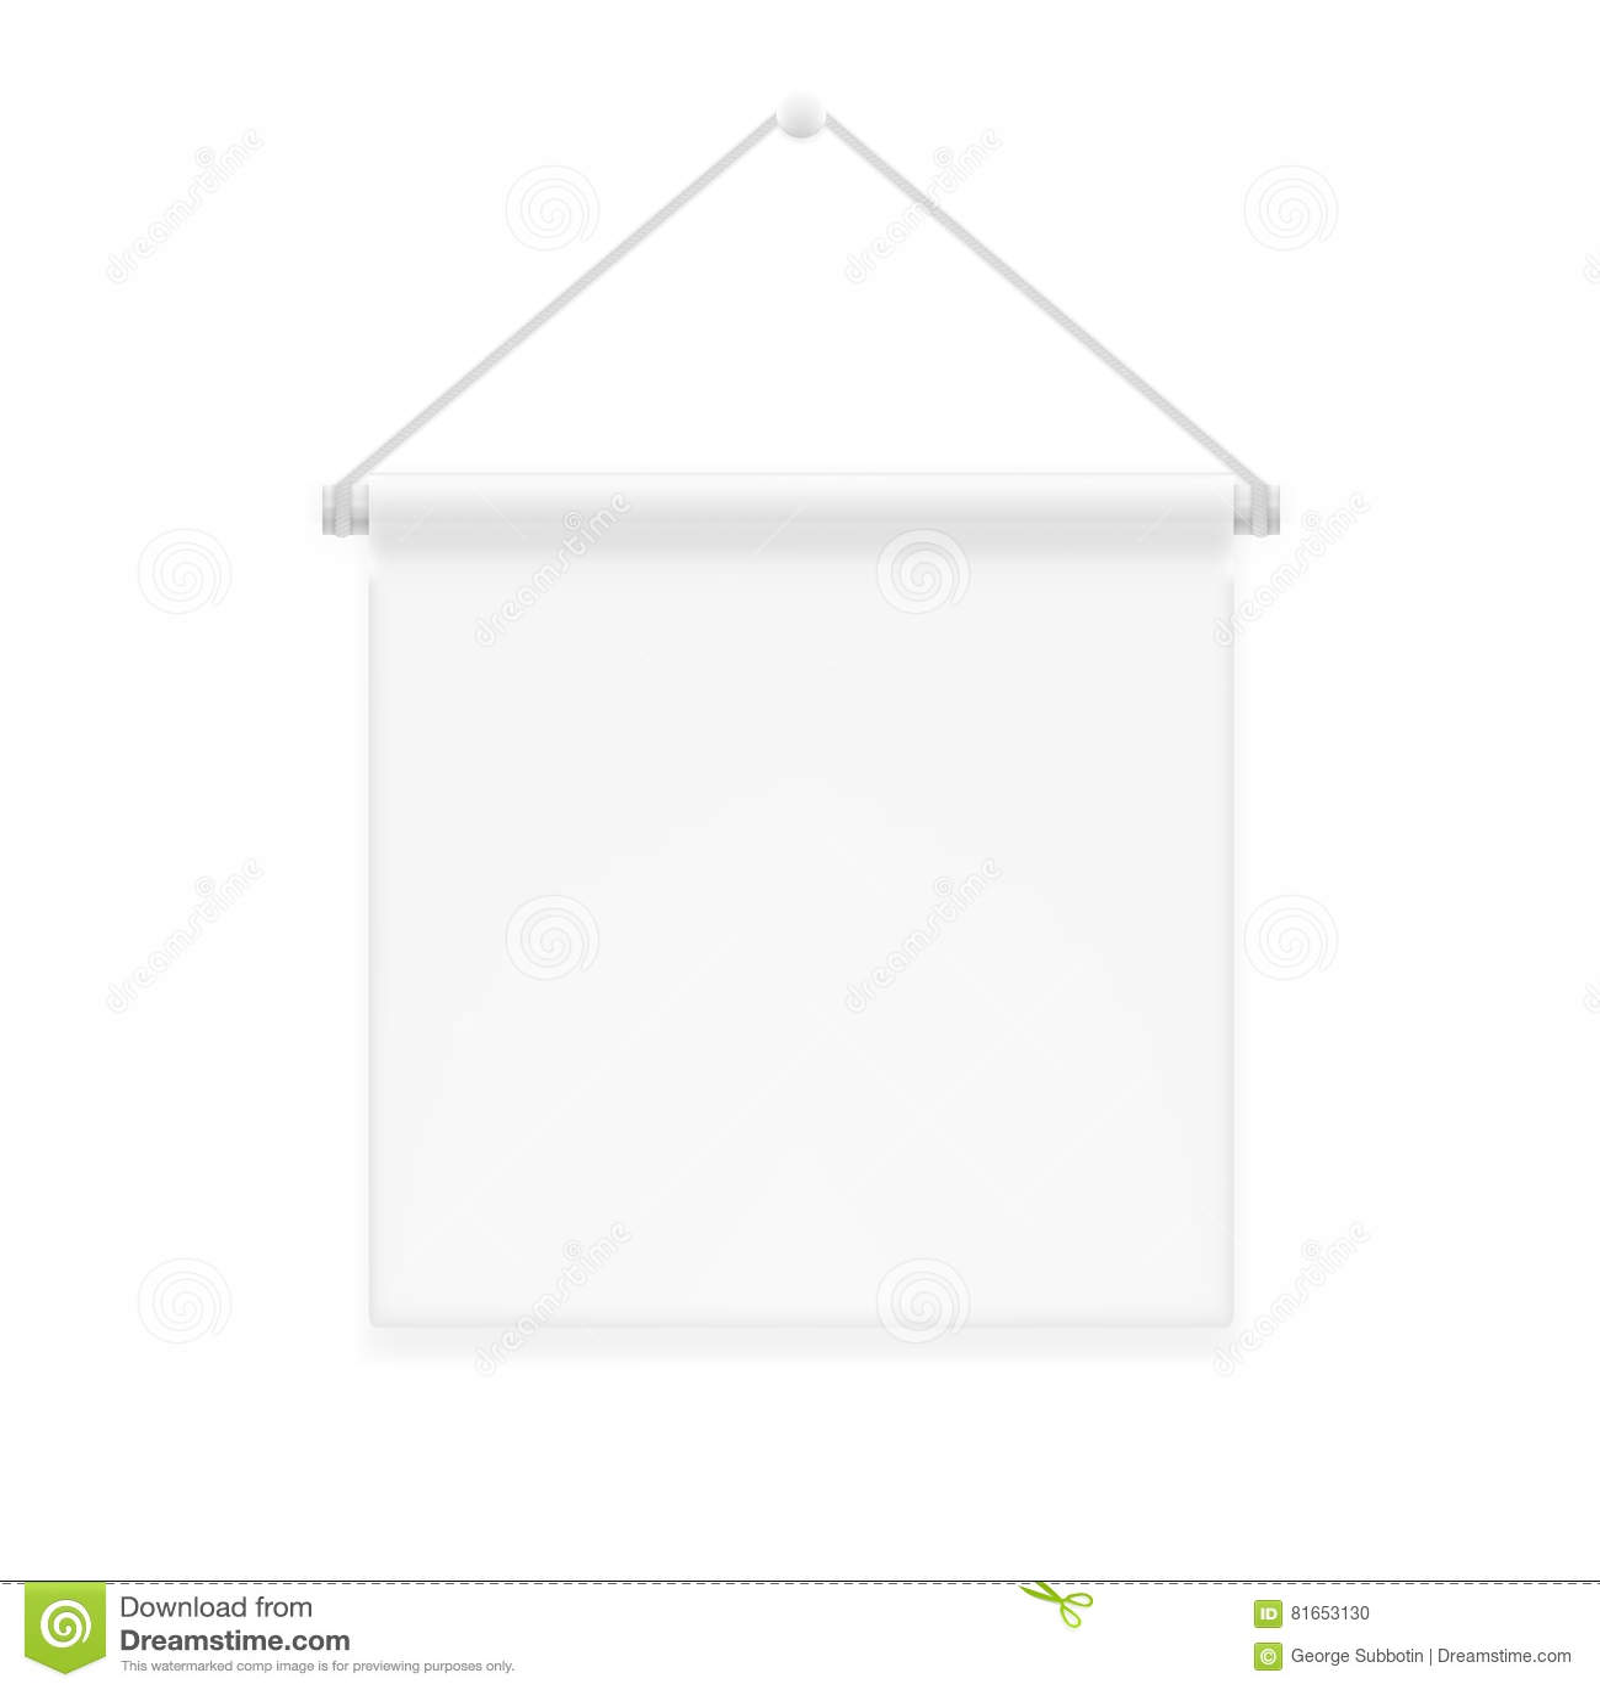 Decor Advertising Shield Canvas Fabric Wall Hanging Award Banner